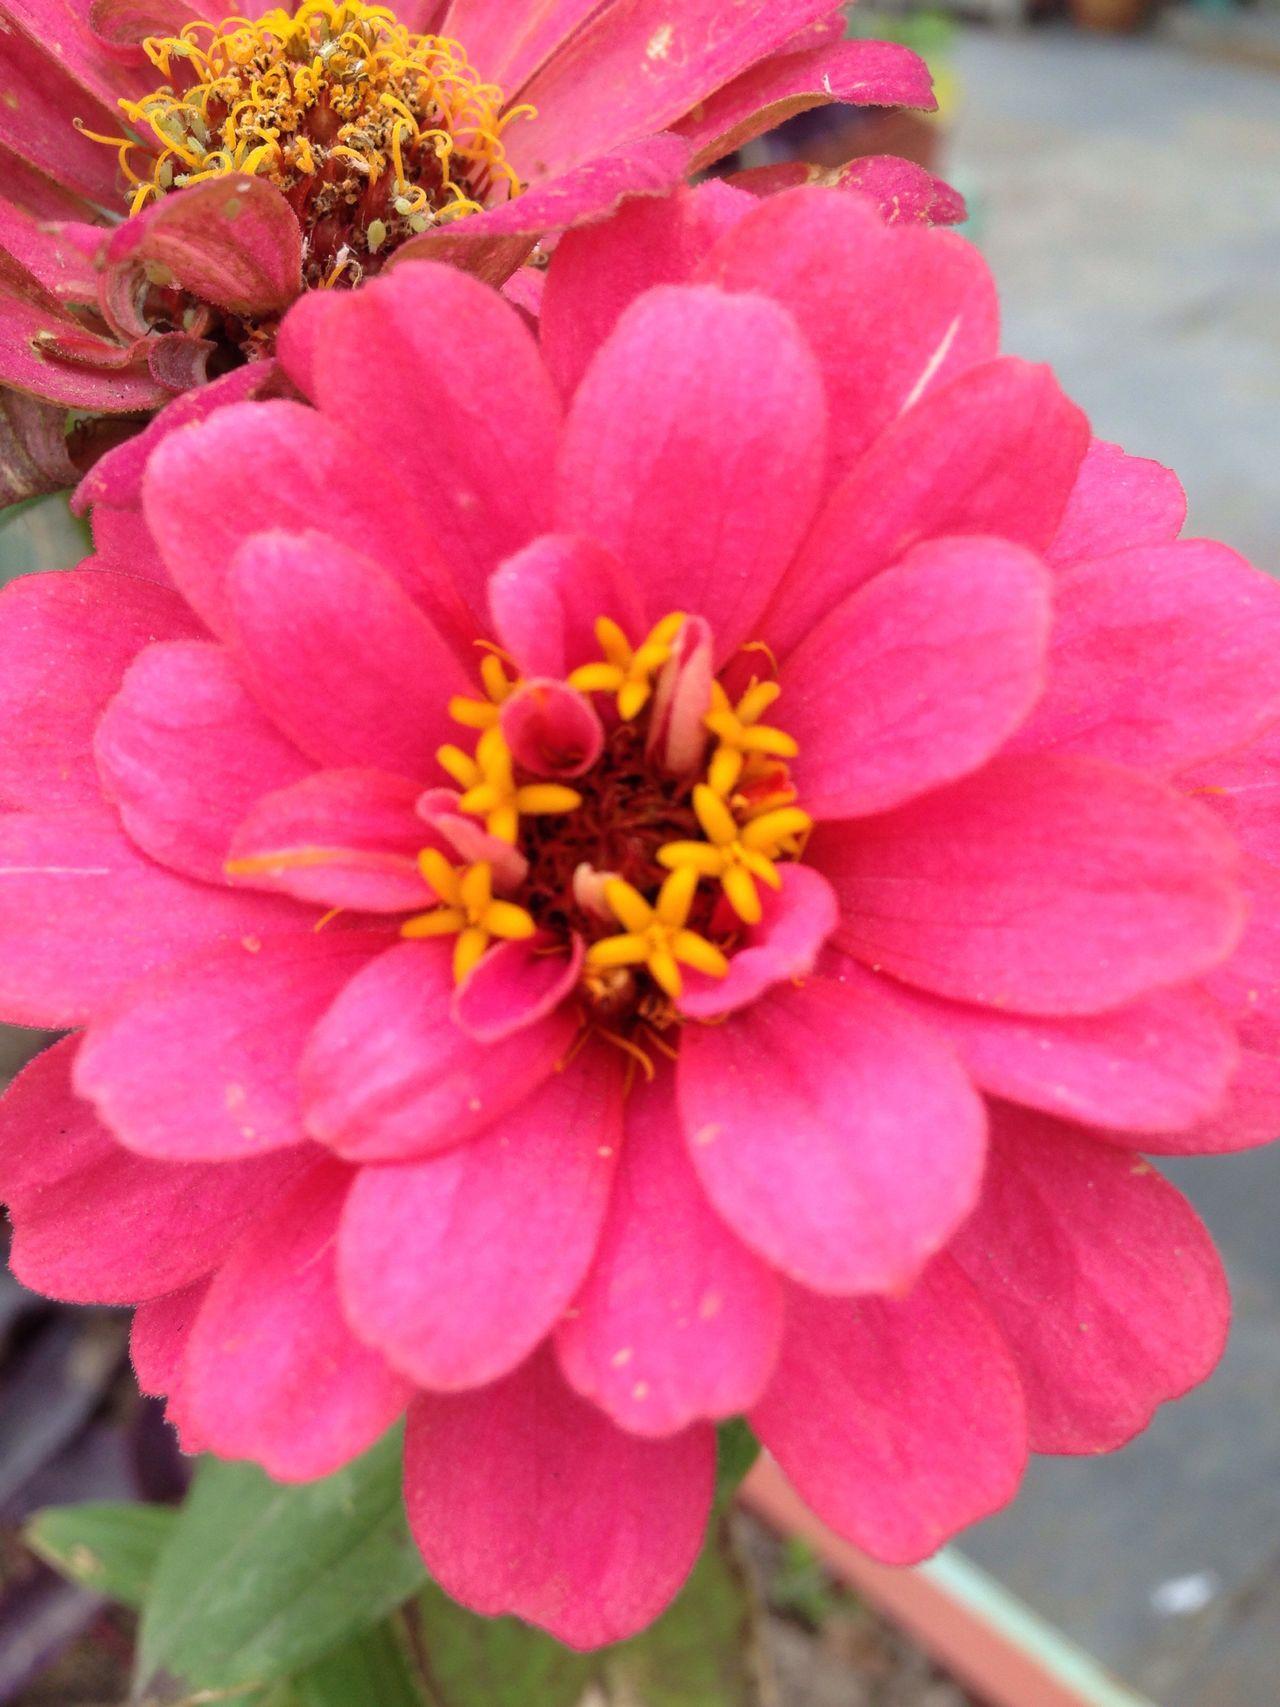 Flower Petal Beauty In Nature Flower Head Pink Color Close-up Kuwait Nature Freshness Outdoors Pollen الكويت Kuwait City